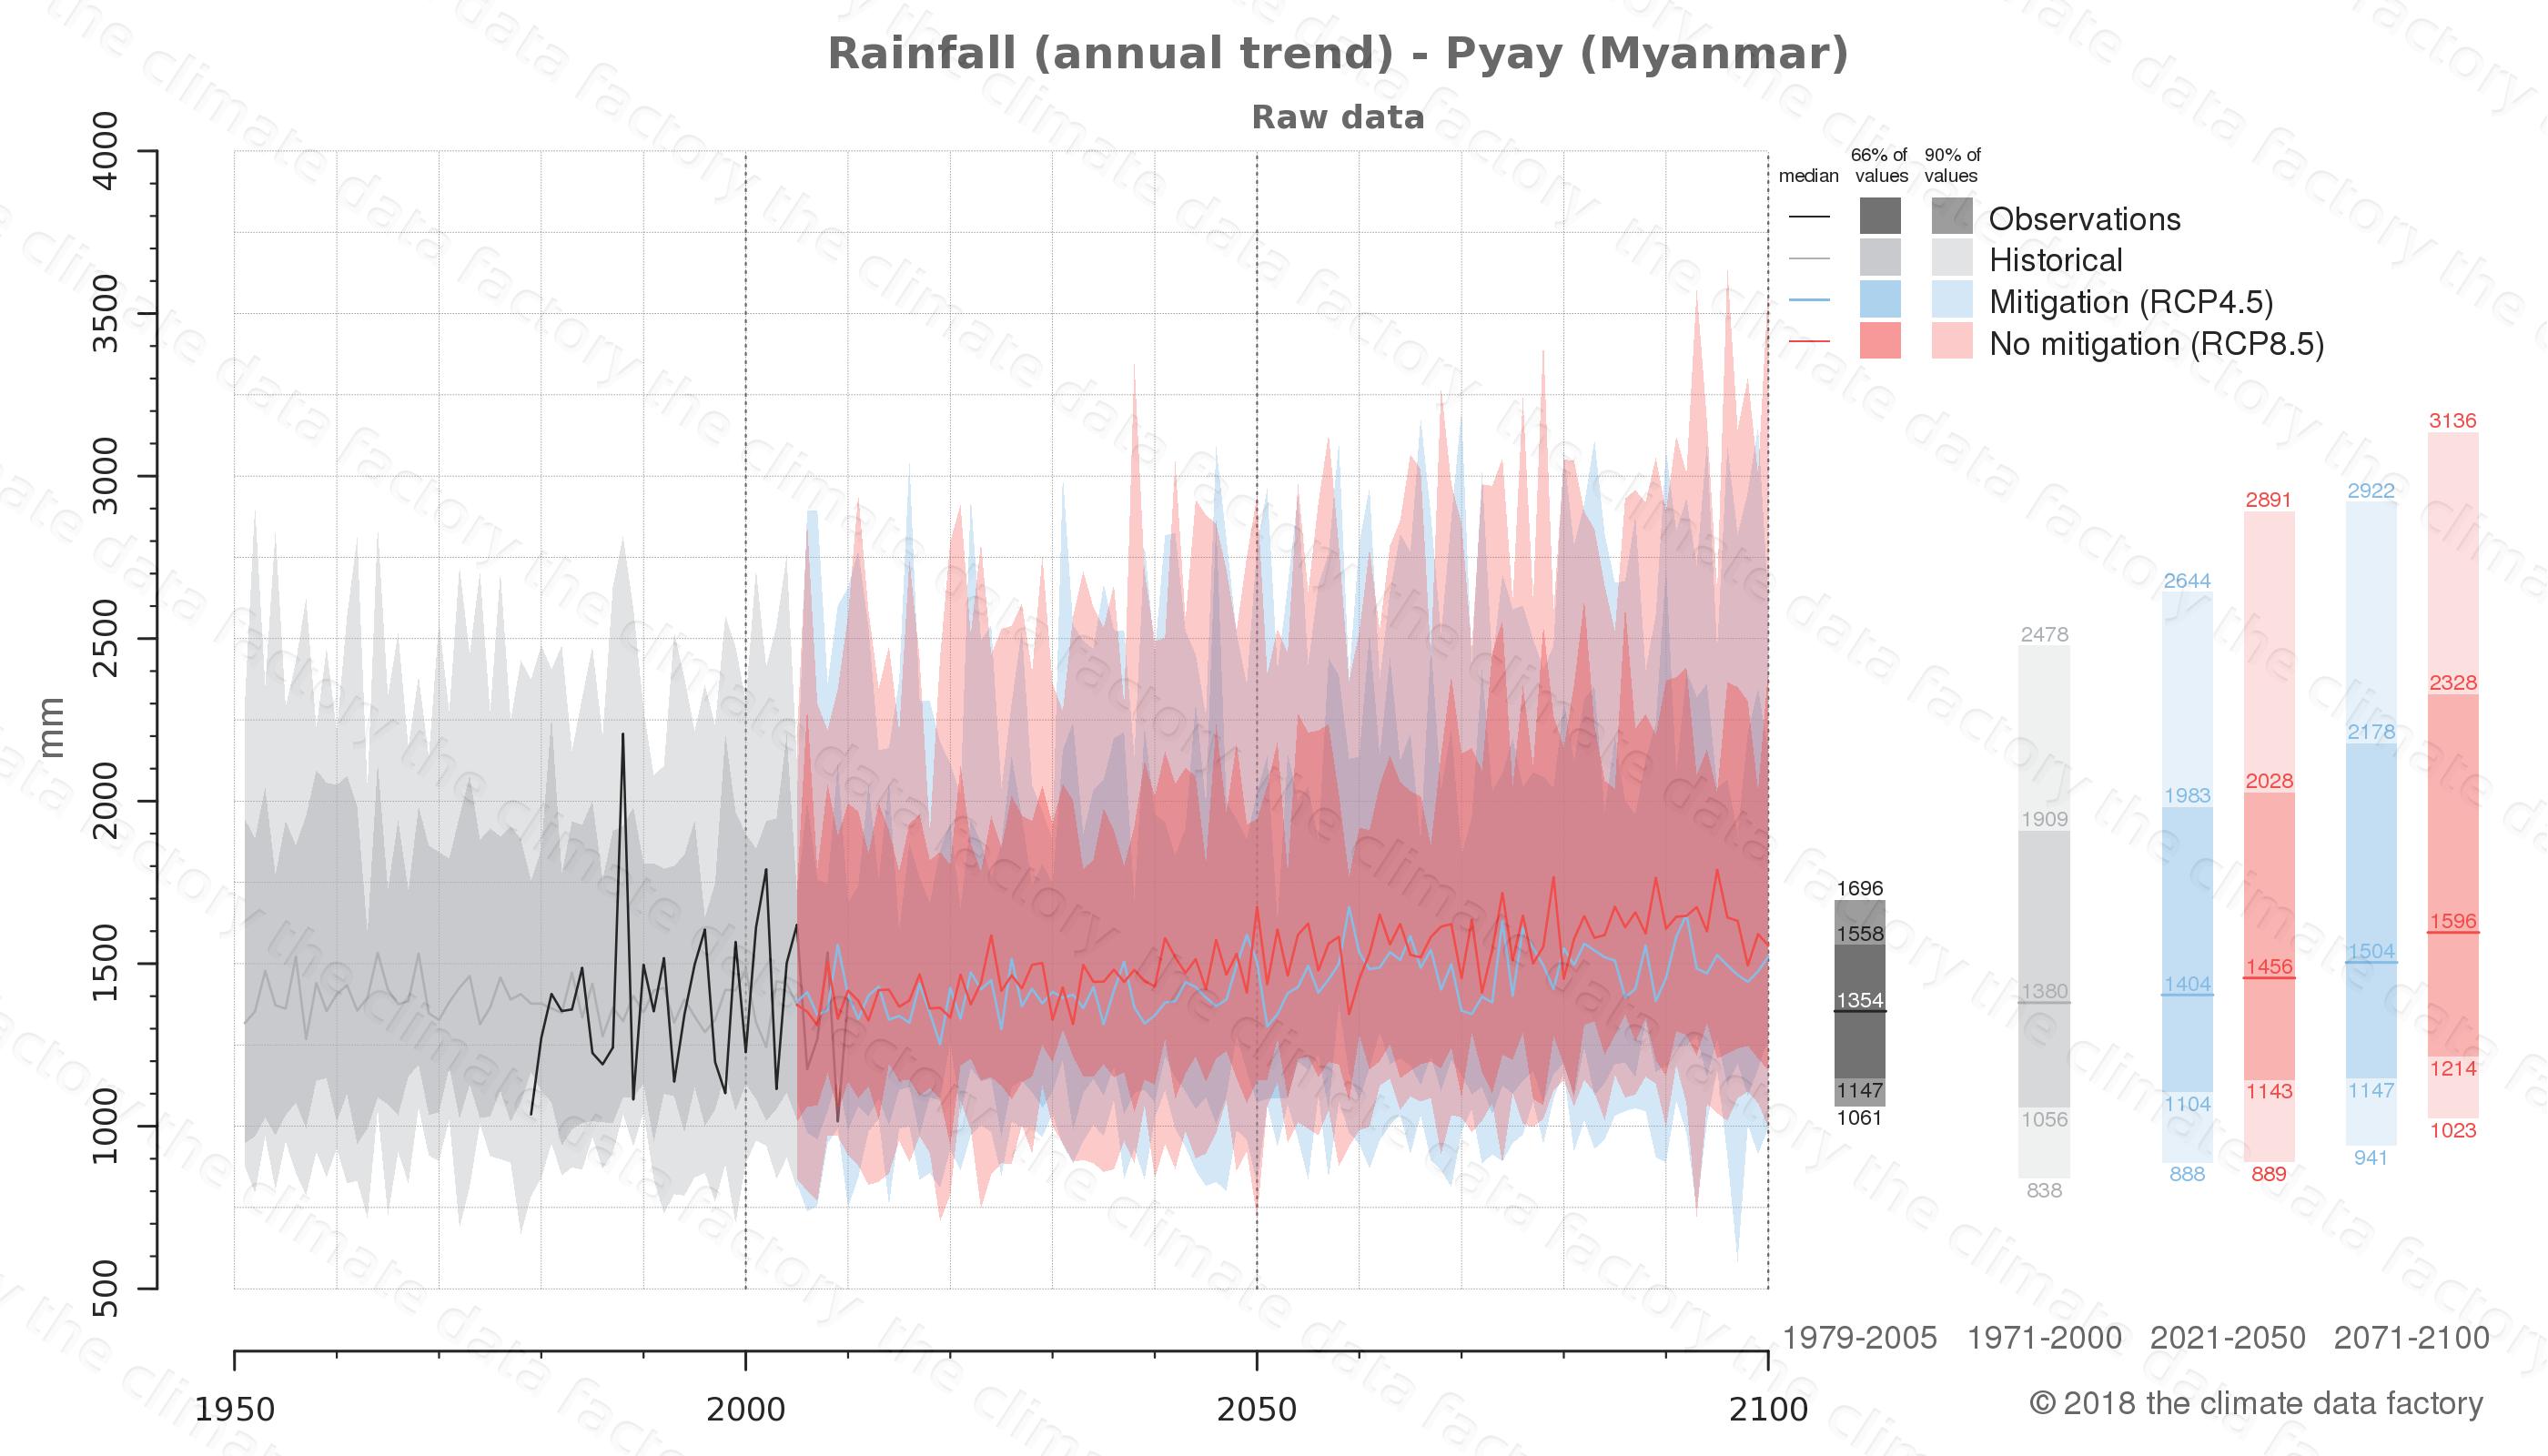 climate change data policy adaptation climate graph city data rainfall pyay myanmar